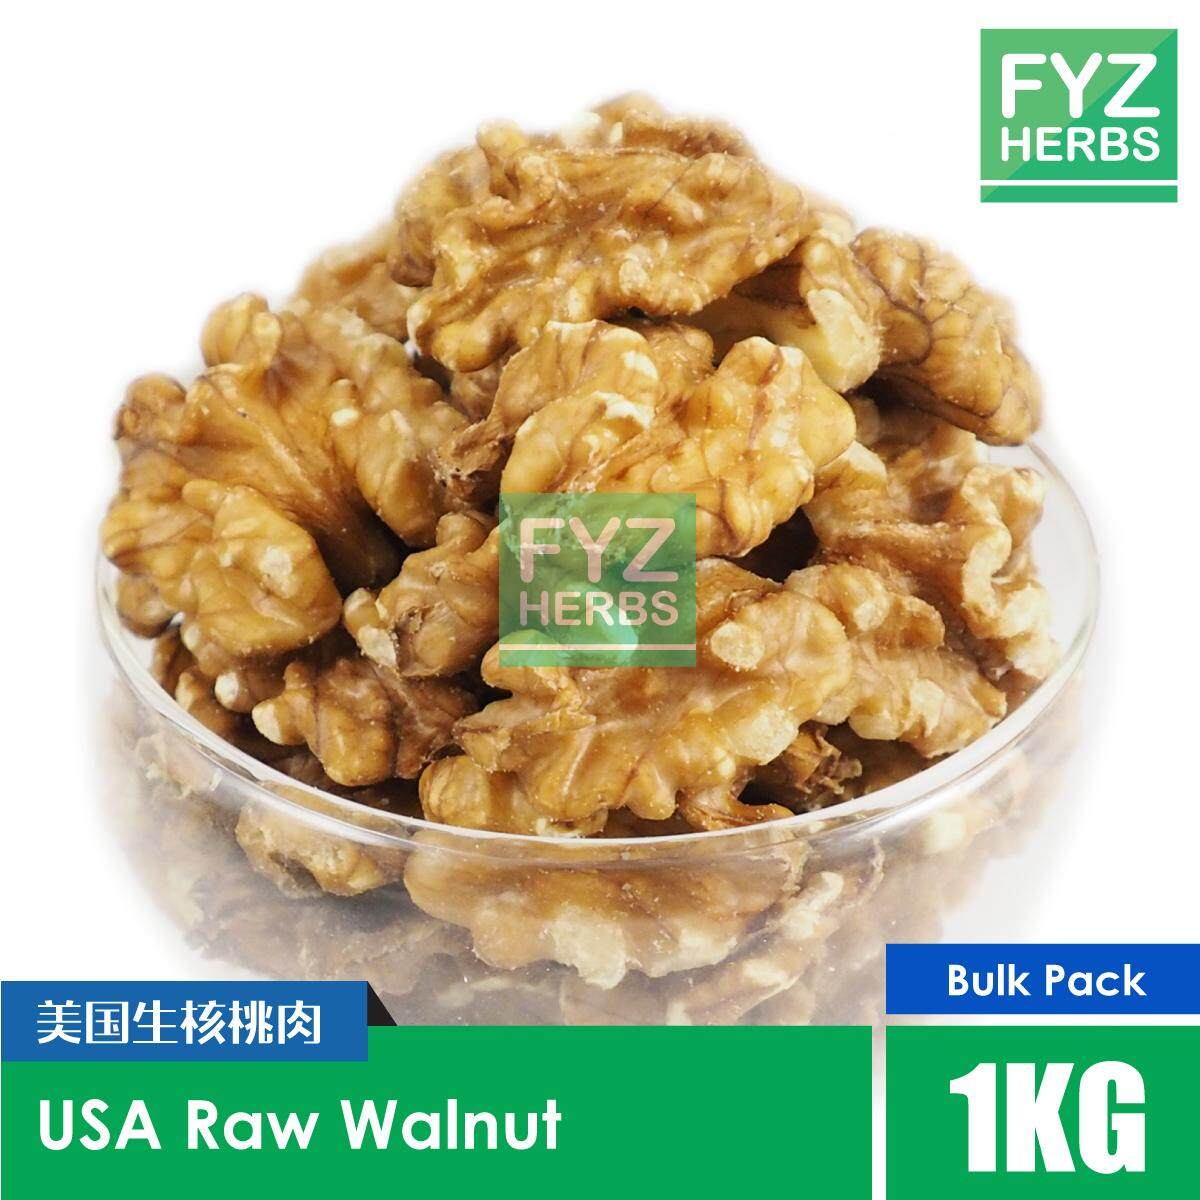 FYZ Herbs USA RAW - Not Roasted Walnut 1KG [Bulk Pack] 美国核桃袋装 1KG